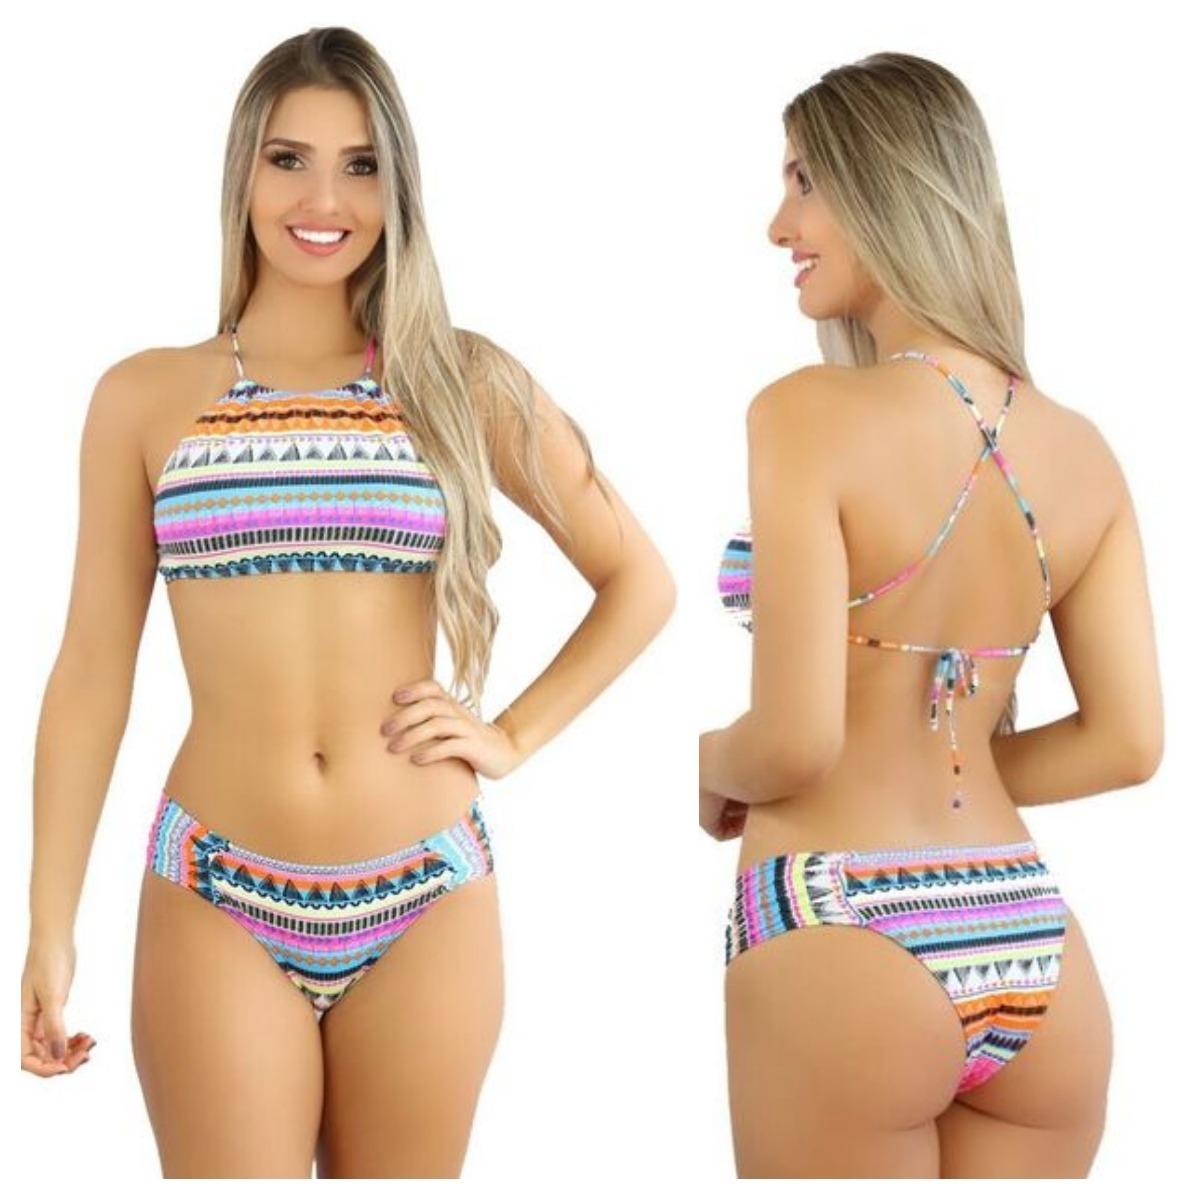 03071ee2c2a6b Biquíni Feminino Top Cropped Moda Praia 2017 2018 C10 - R  117,66 em ...